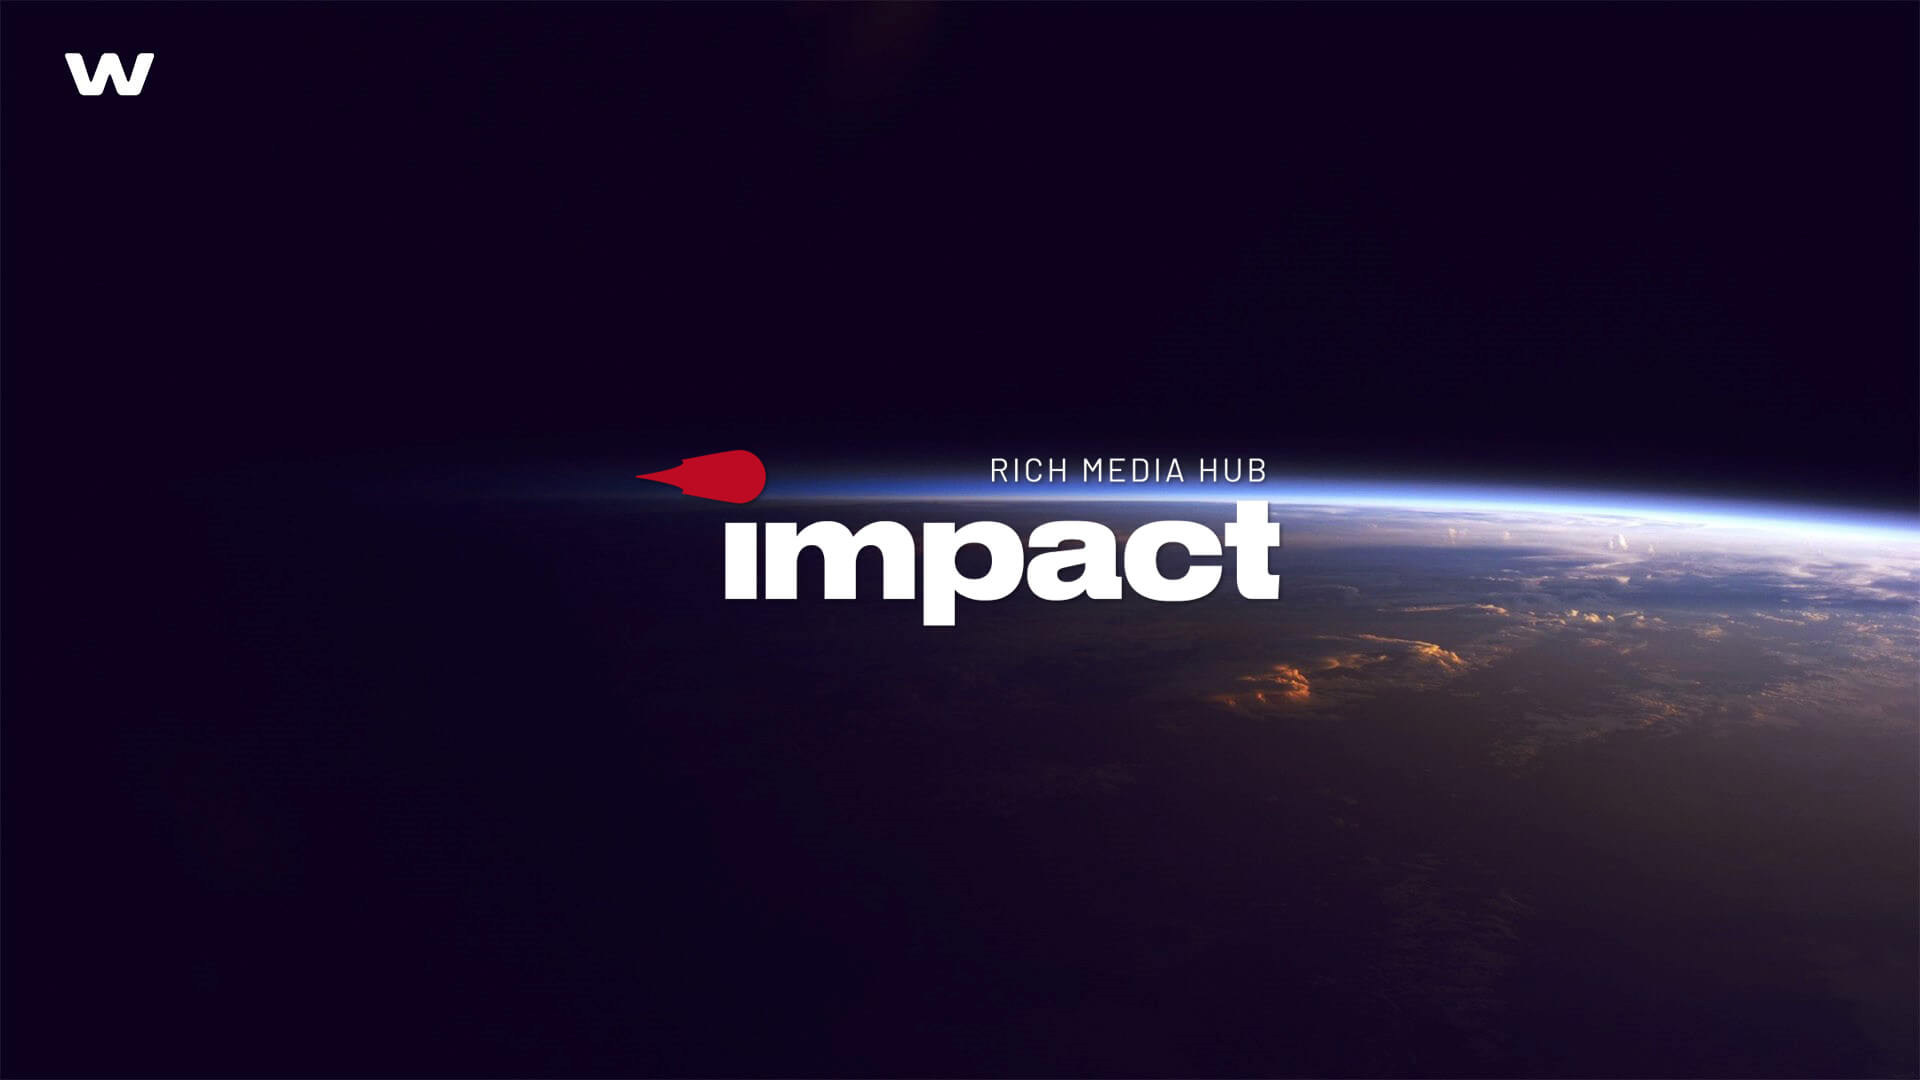 289325 impact image 2eface original 1536218753